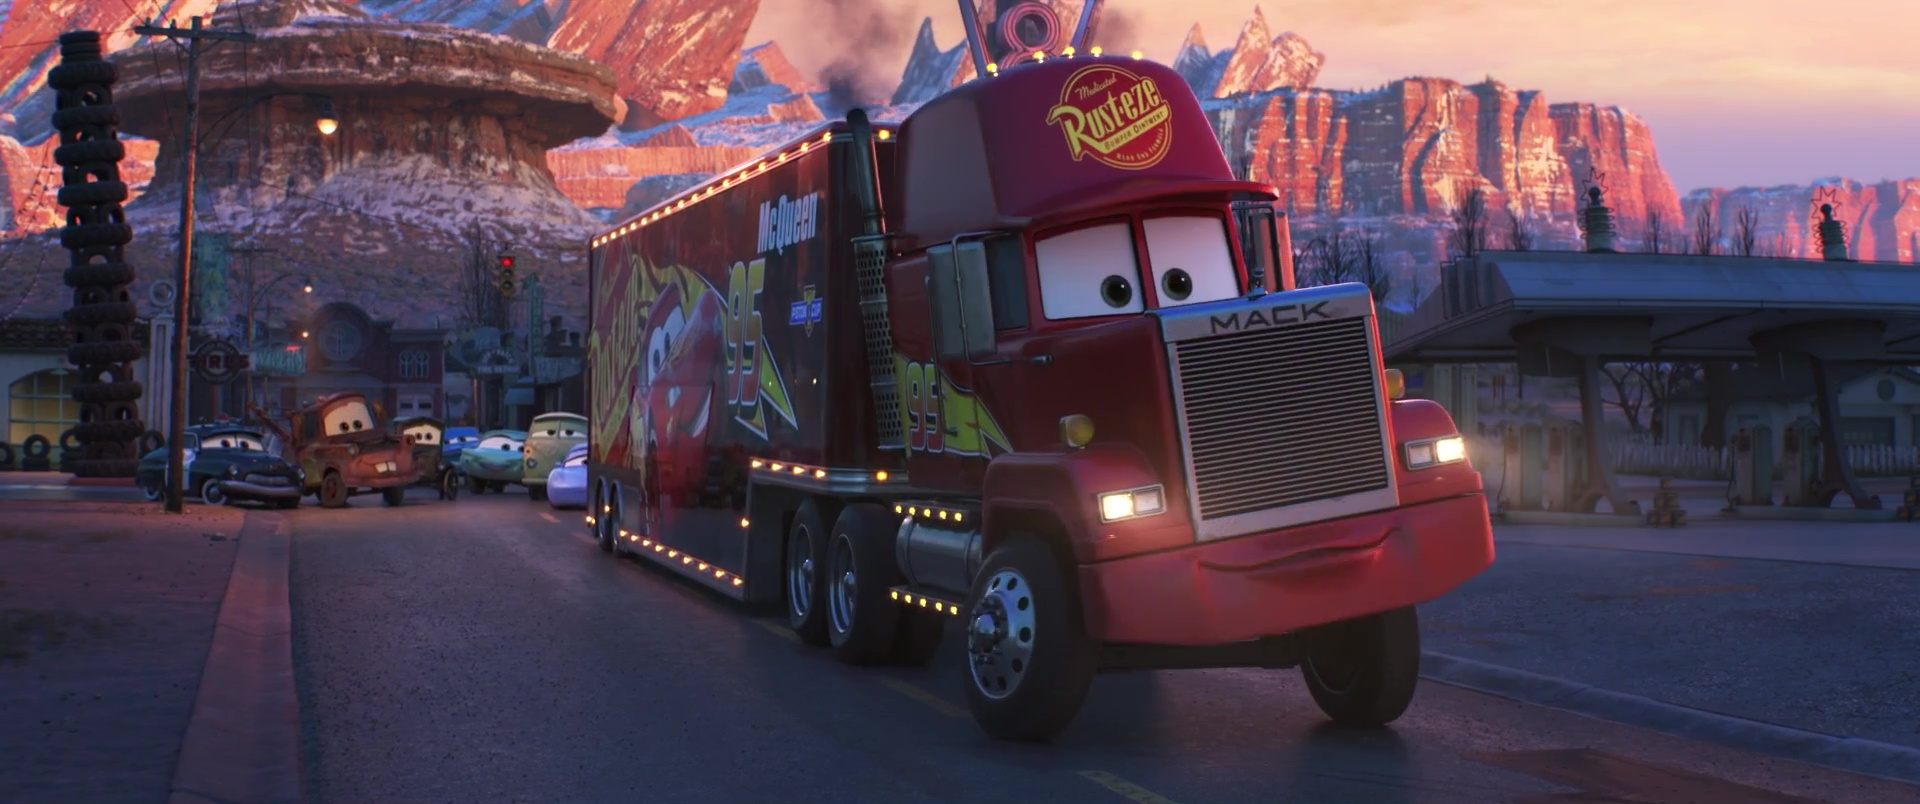 Mack Personnage Dans Cars Pixar Planet Fr